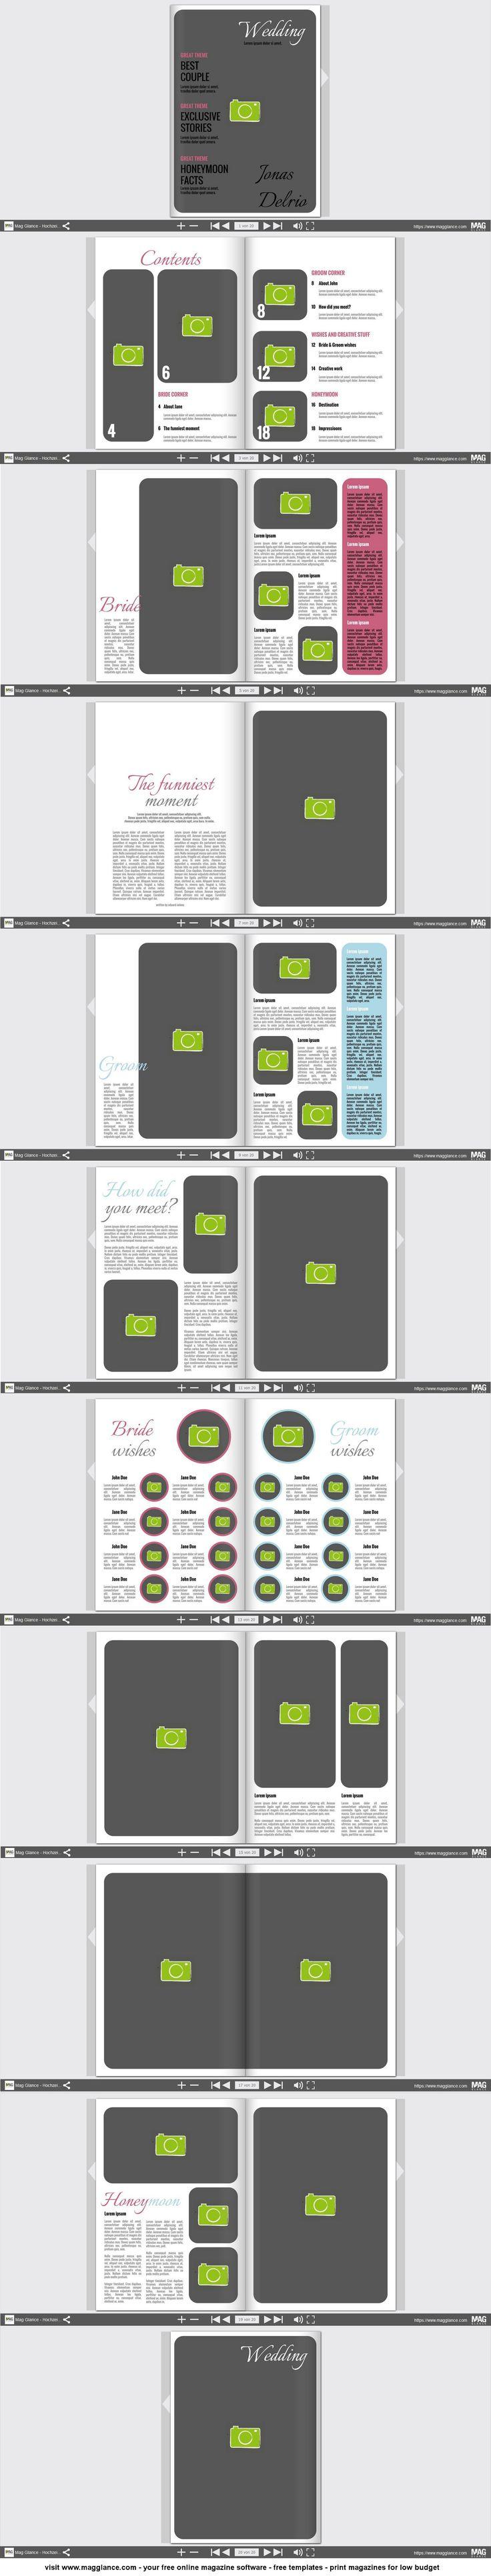 Ausgezeichnet Schaltplan Design Fotos - Verdrahtungsideen - korsmi.info